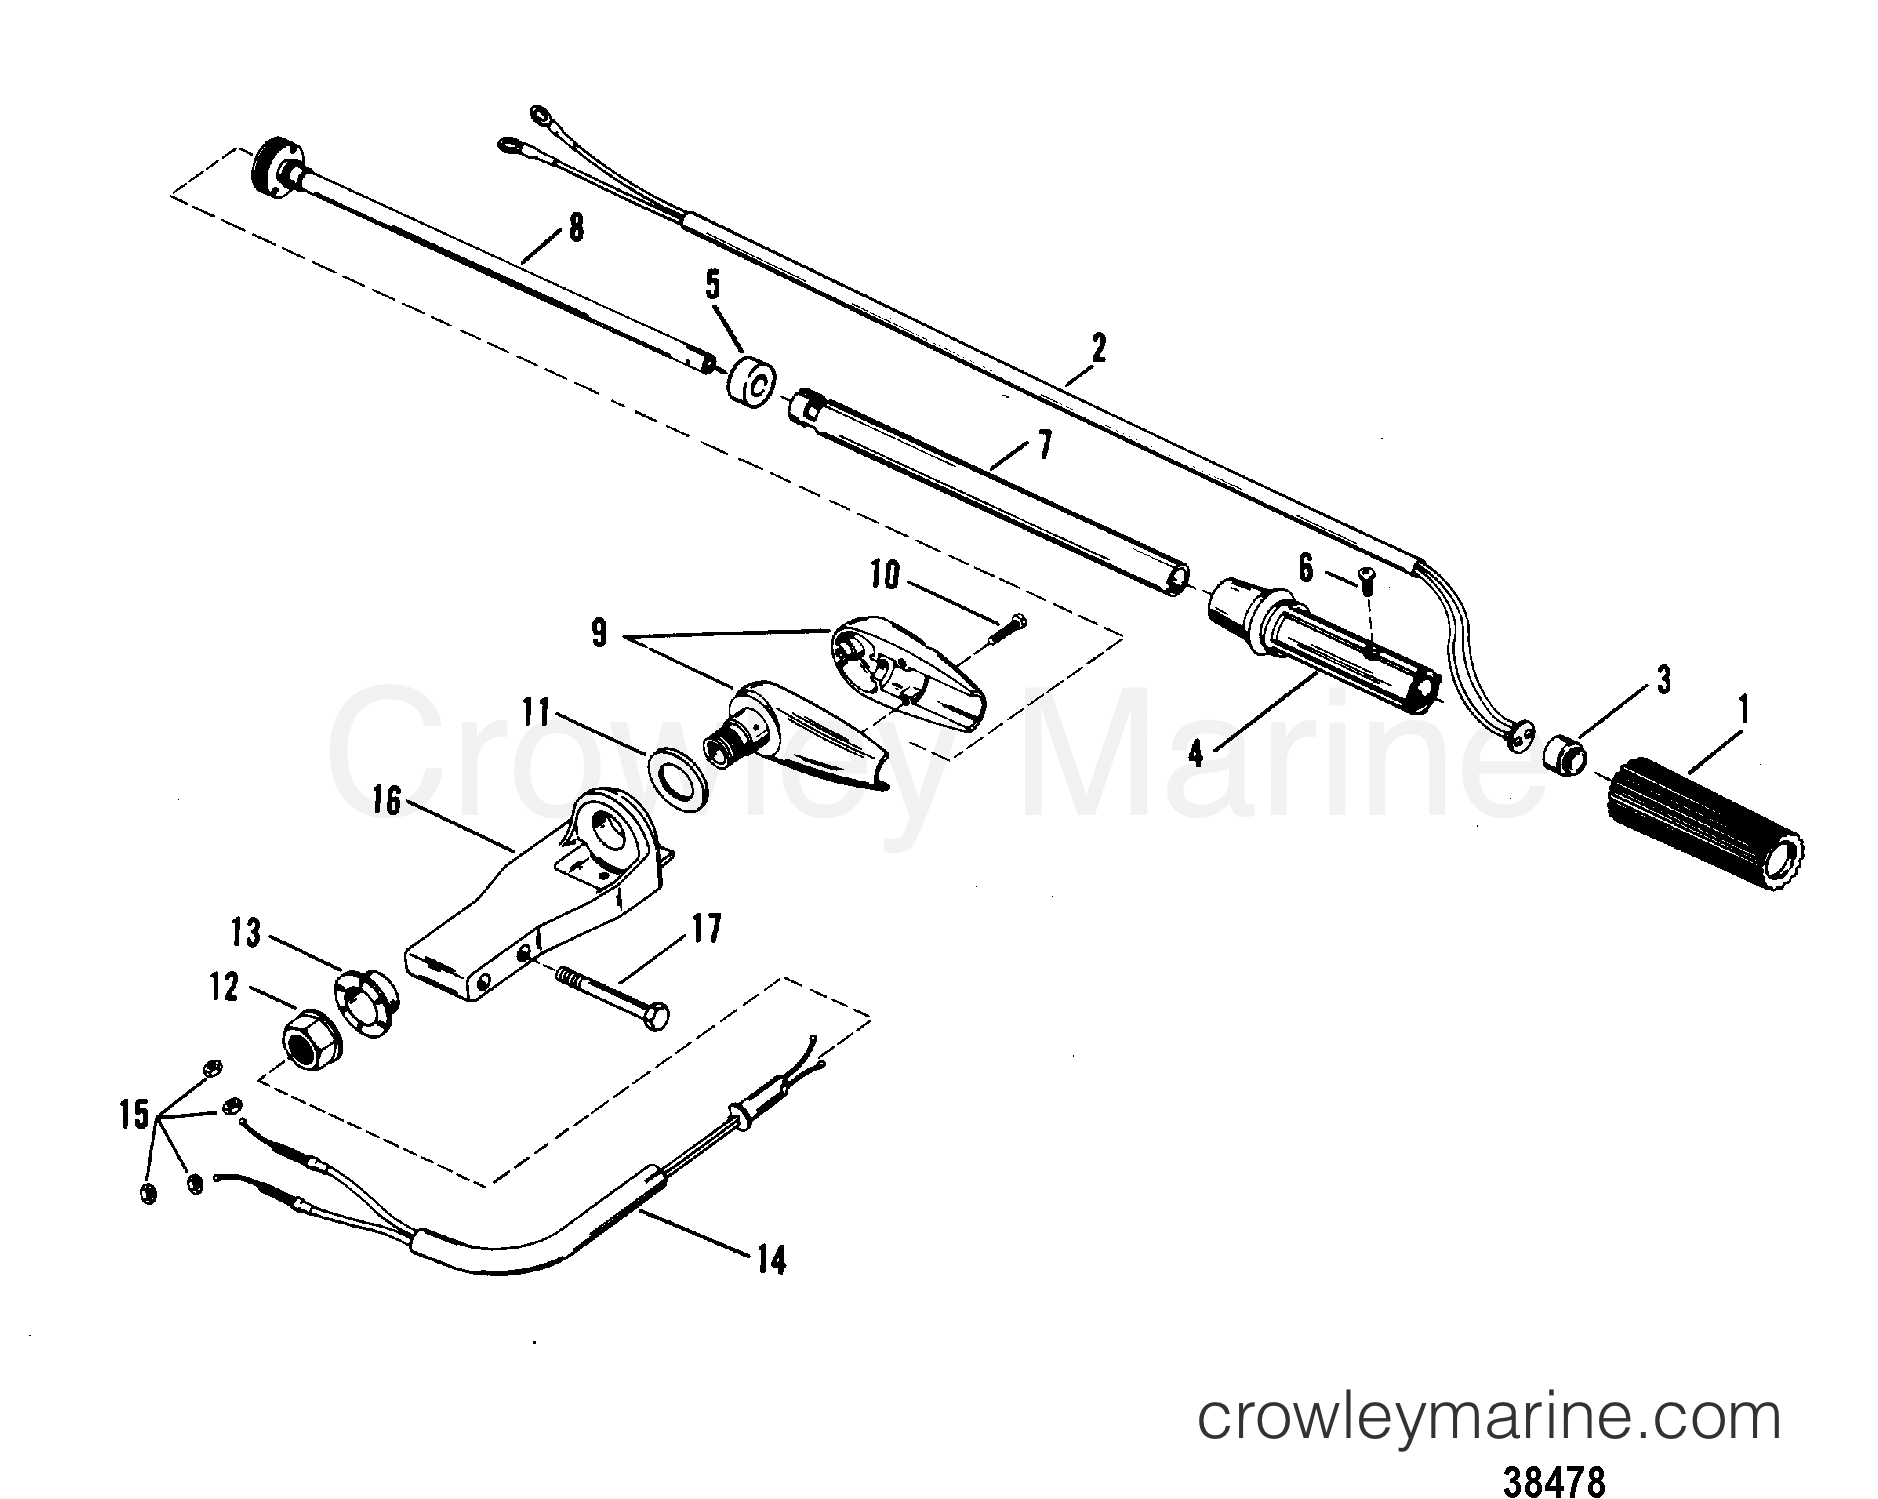 Steering Handle Assembly Mariner Manual